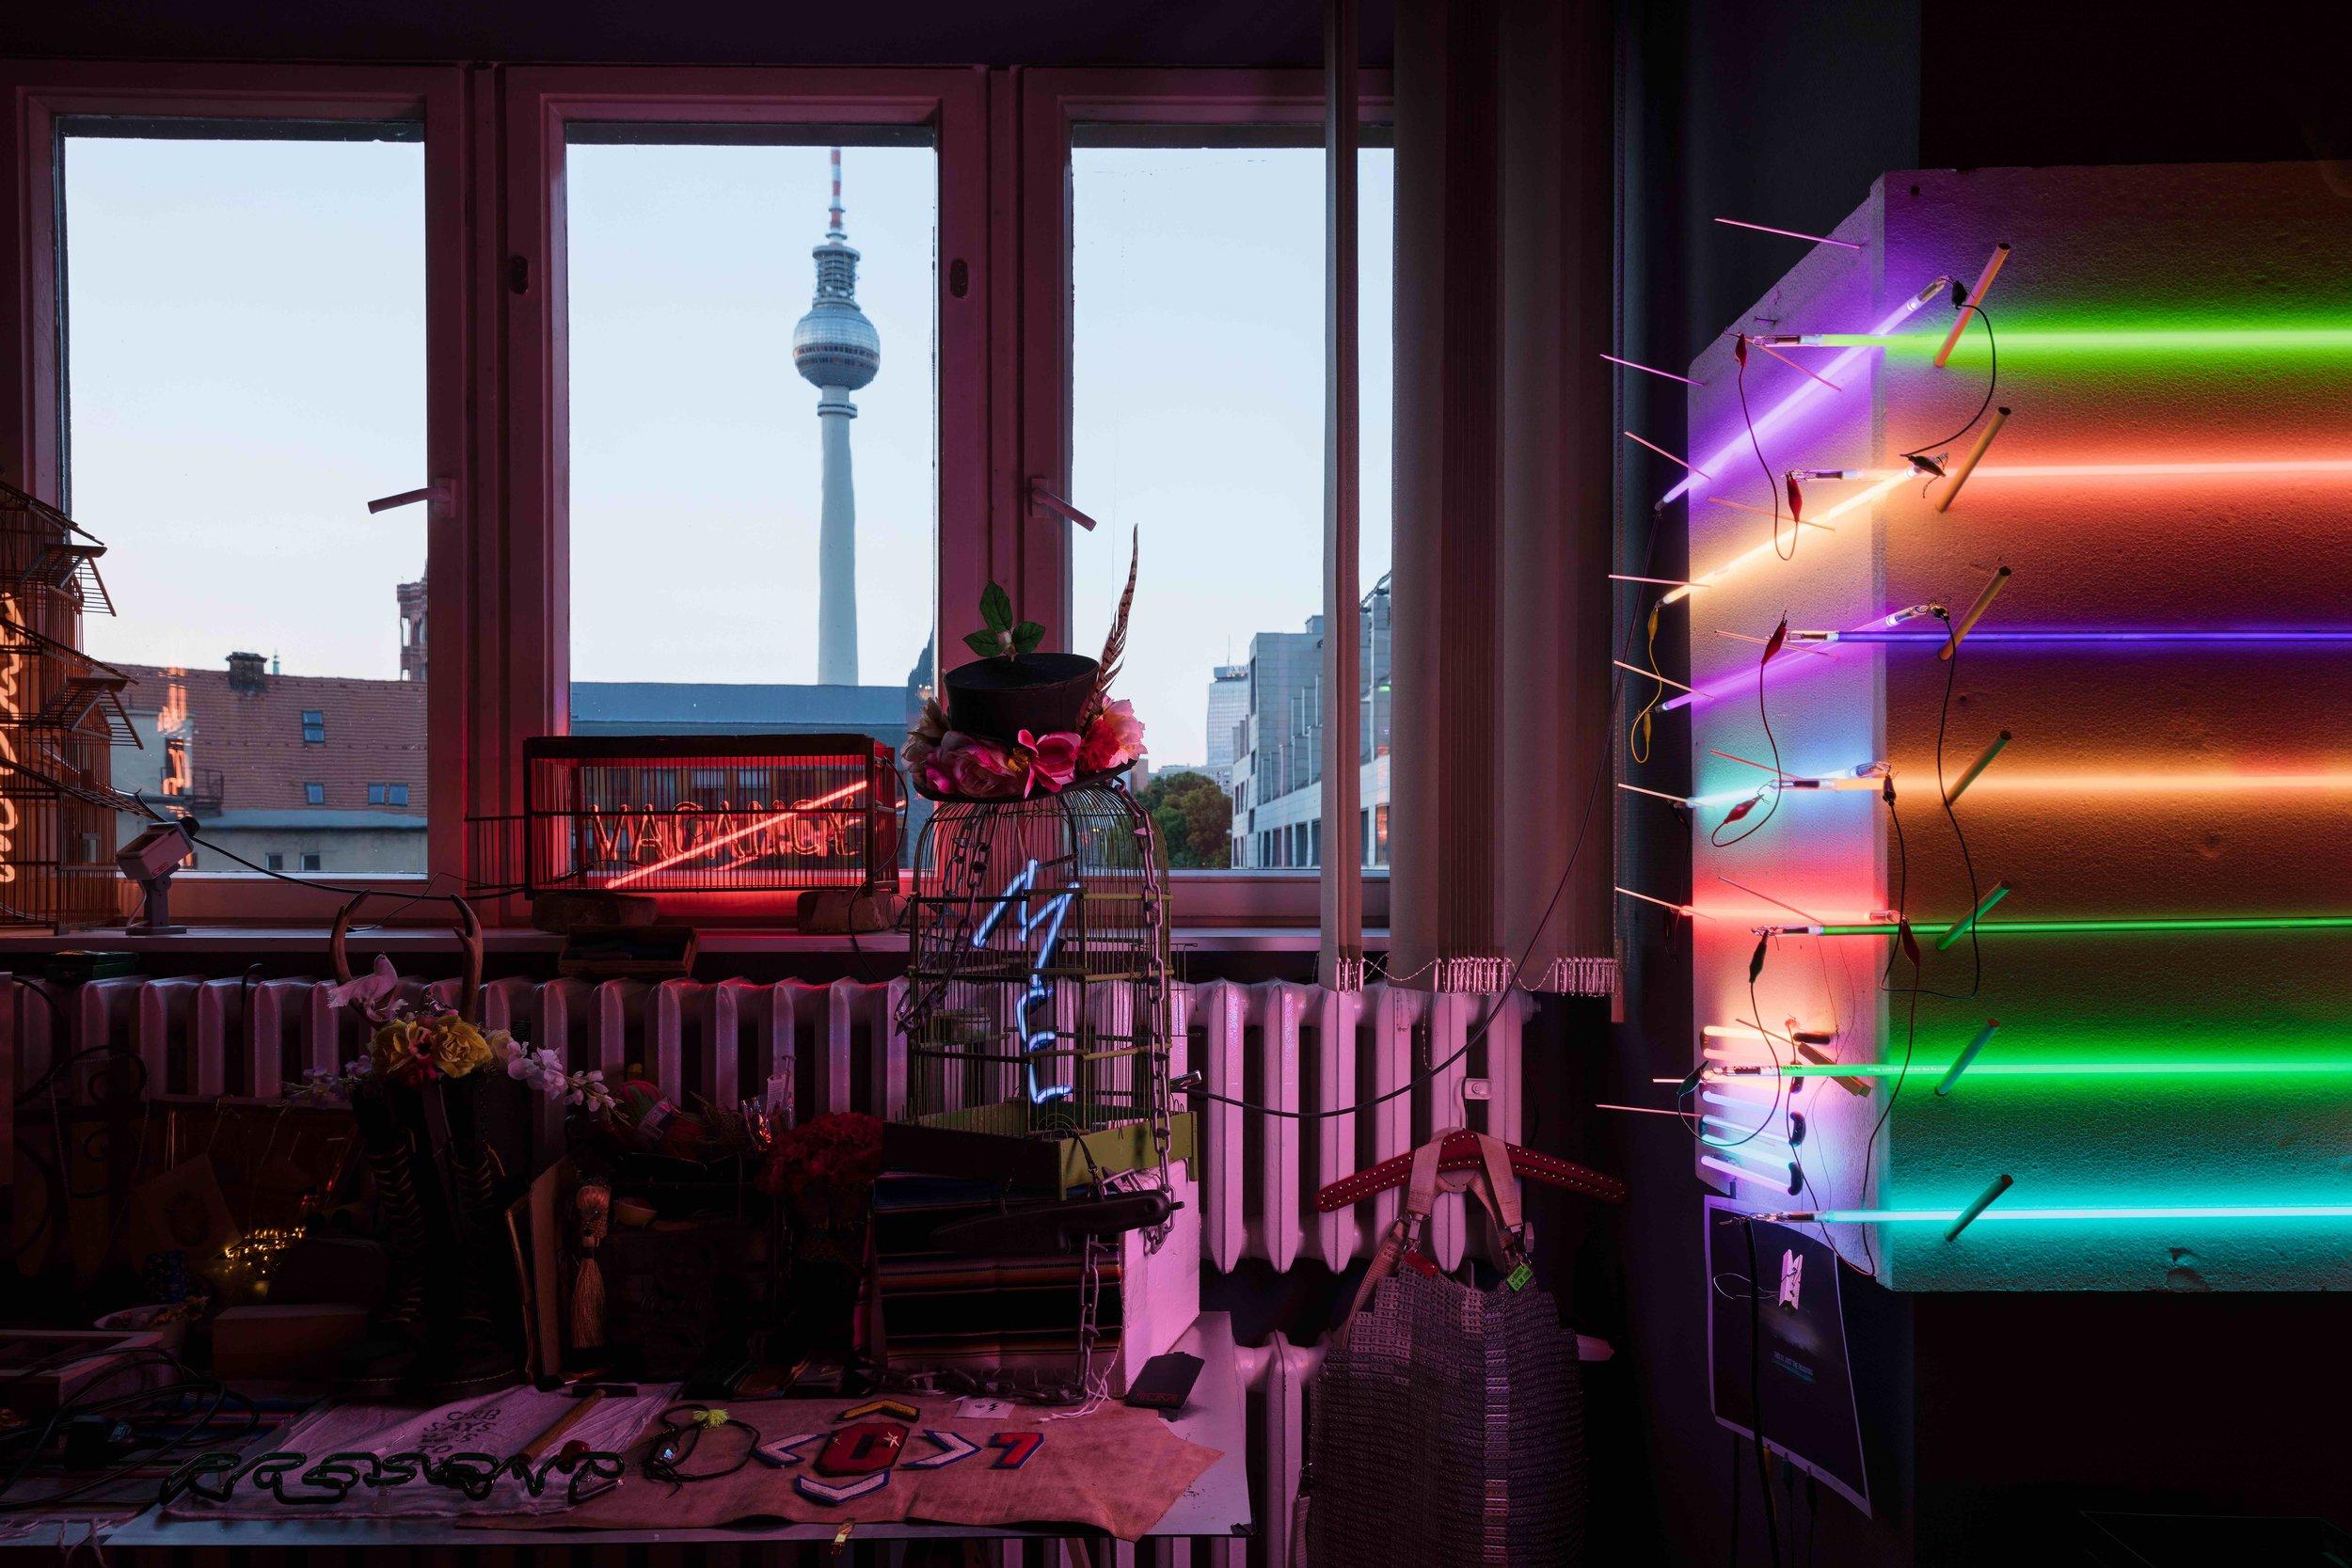 Olivia Steele Artist Studio Berlin Germany Neon TV Tower Alte Munze